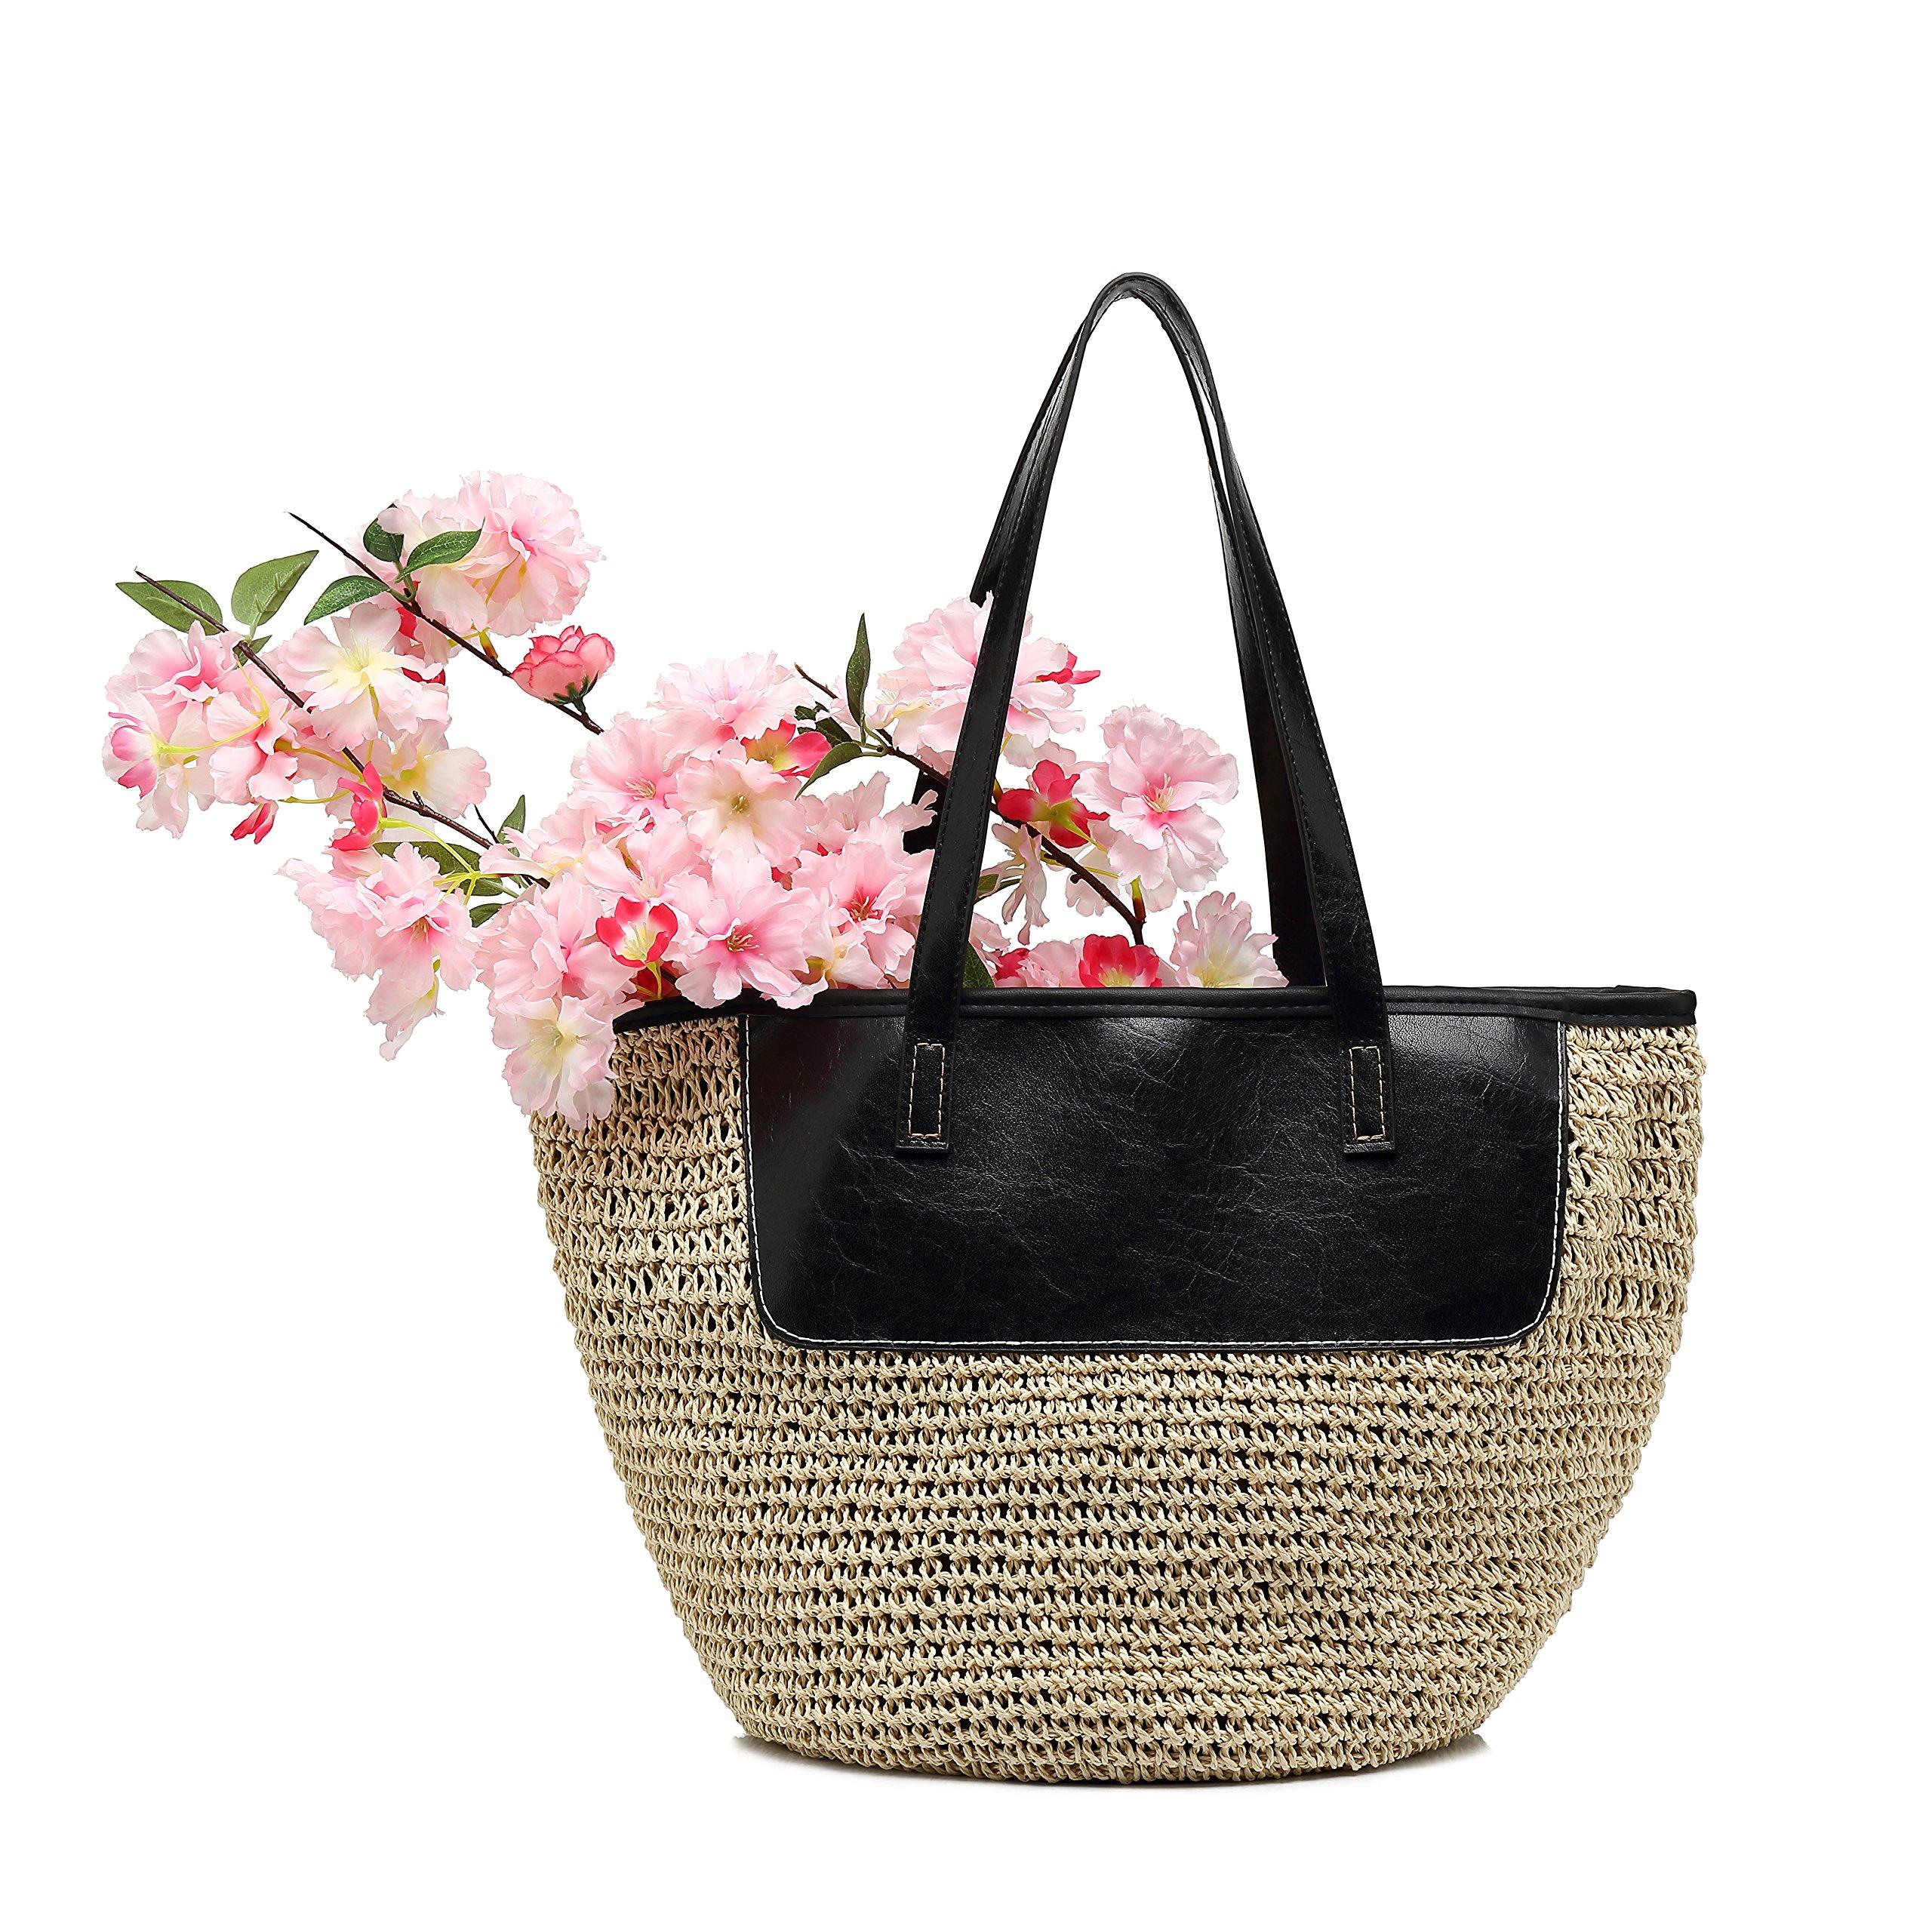 Luolin Straw Summer Bags Beach Tote Bag Weave Handbags Handmade for Women Designer with Zipper